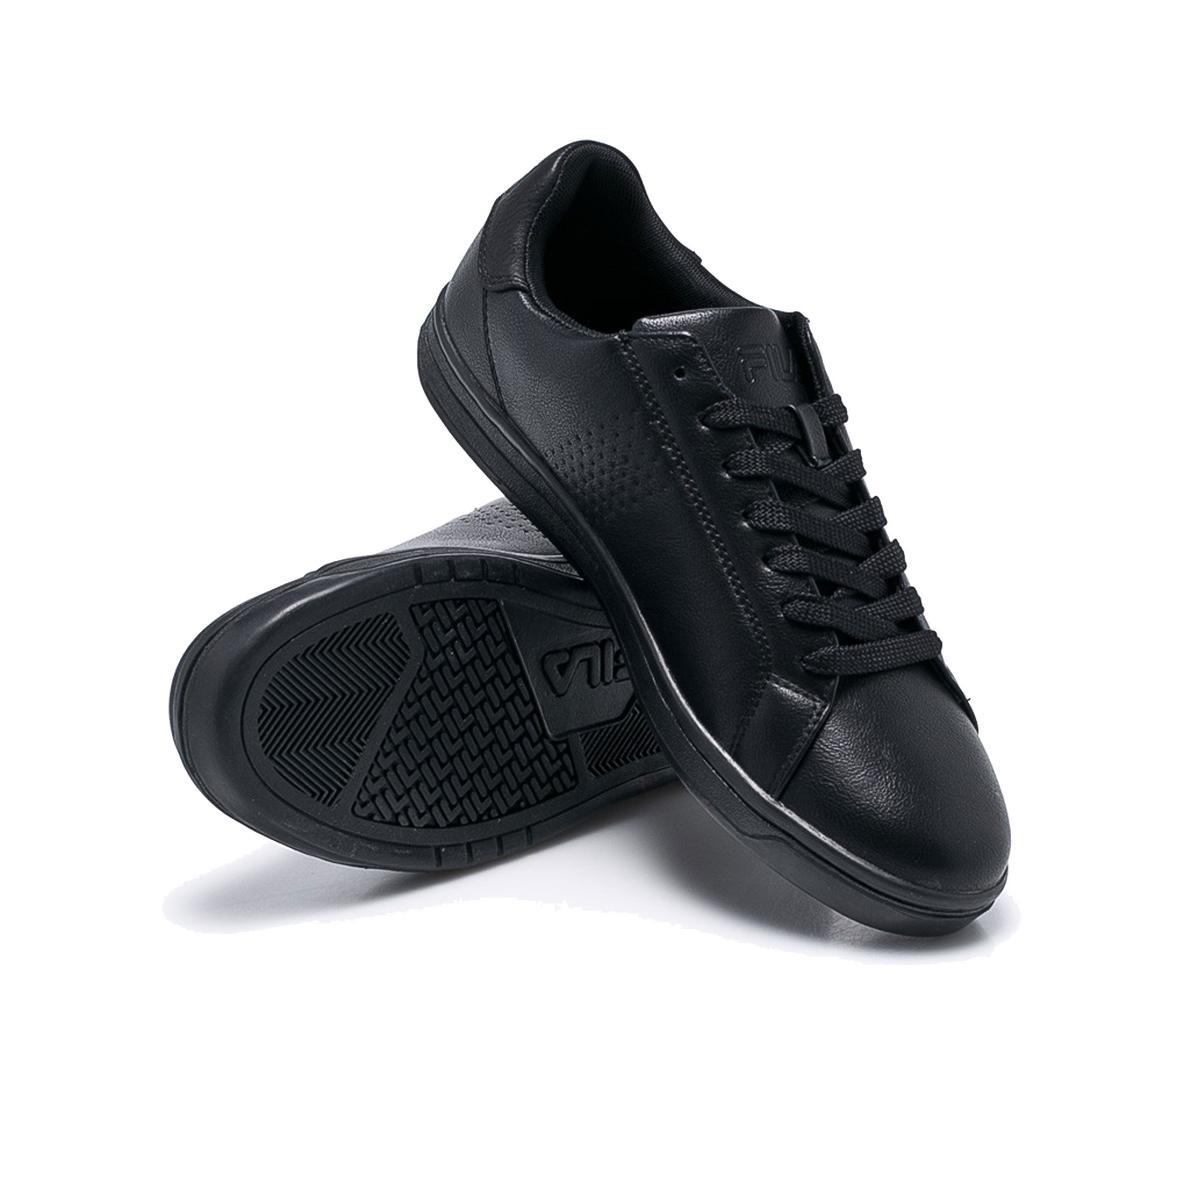 Scarpe Sneakers FILA CROSSCOURT 2 LOW da uomo rif. 1010274.12V